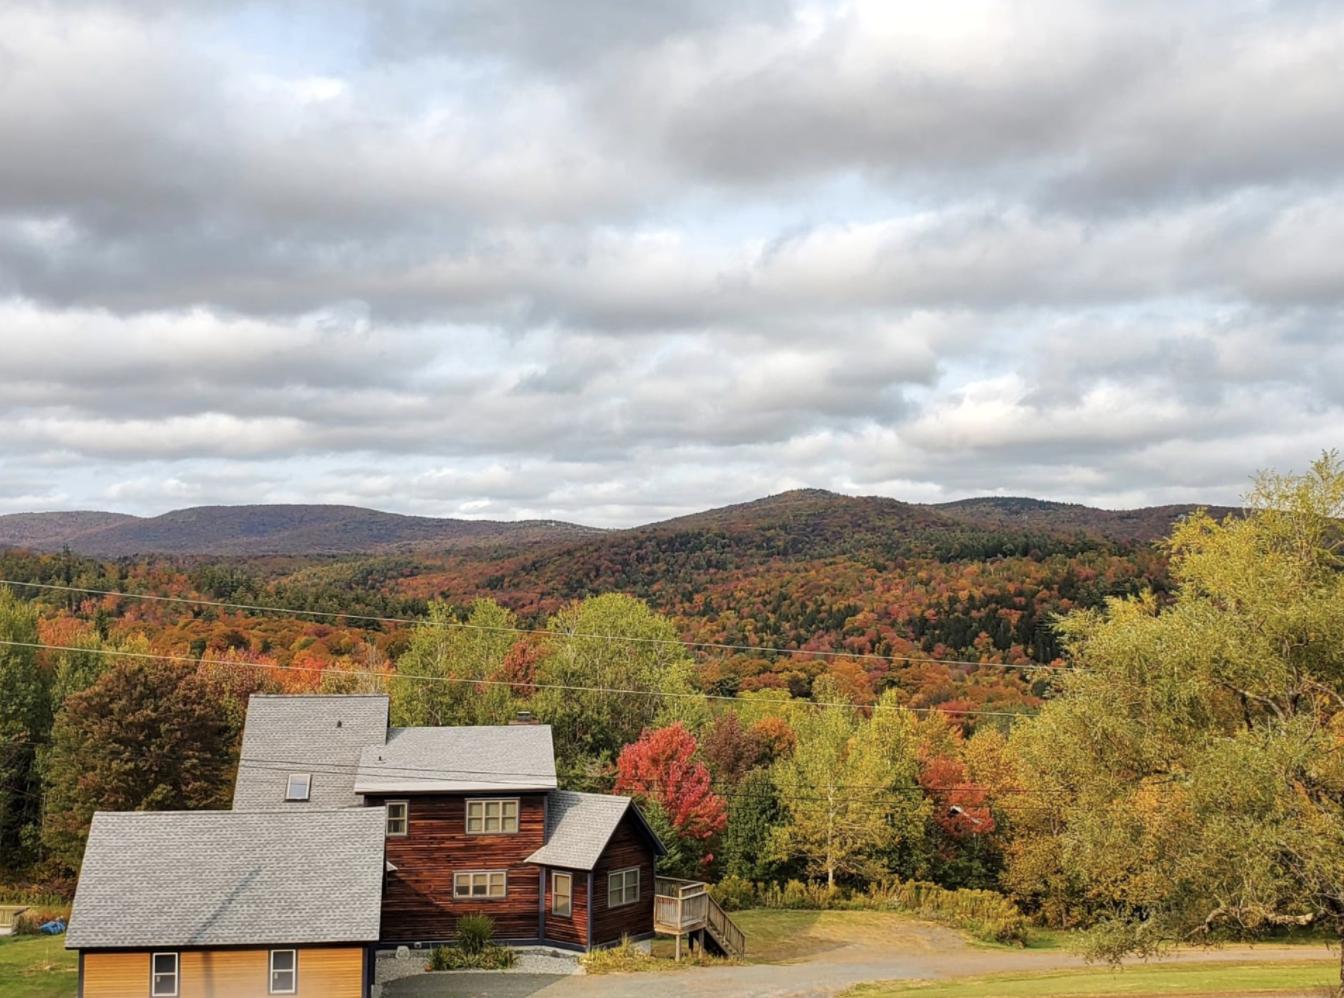 Plan an affordable leaf peeping getaway in Vermont with HomeExchange